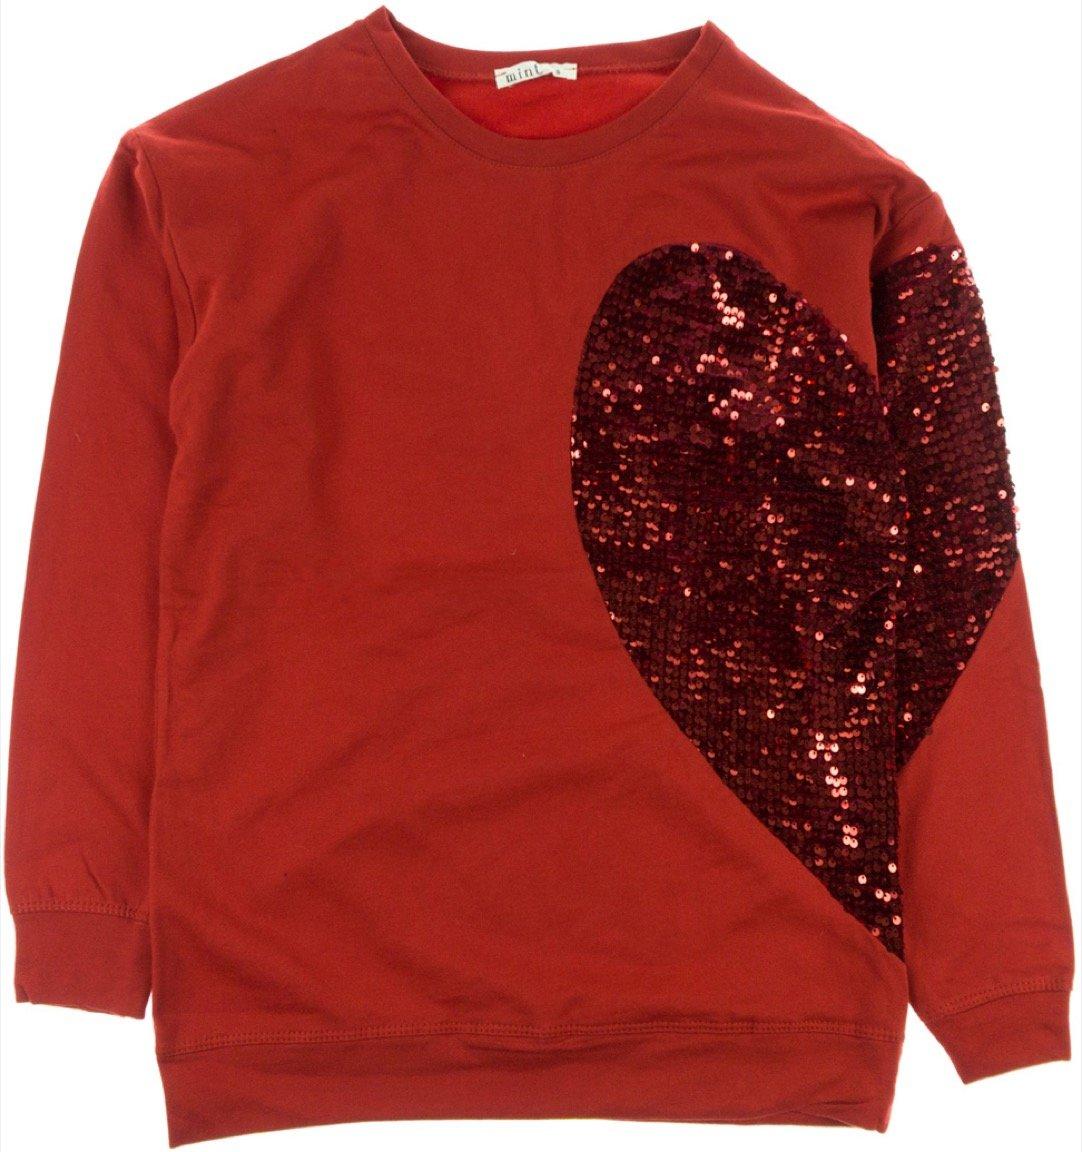 Mint γυναικεία μπλούζα «Red Heart»